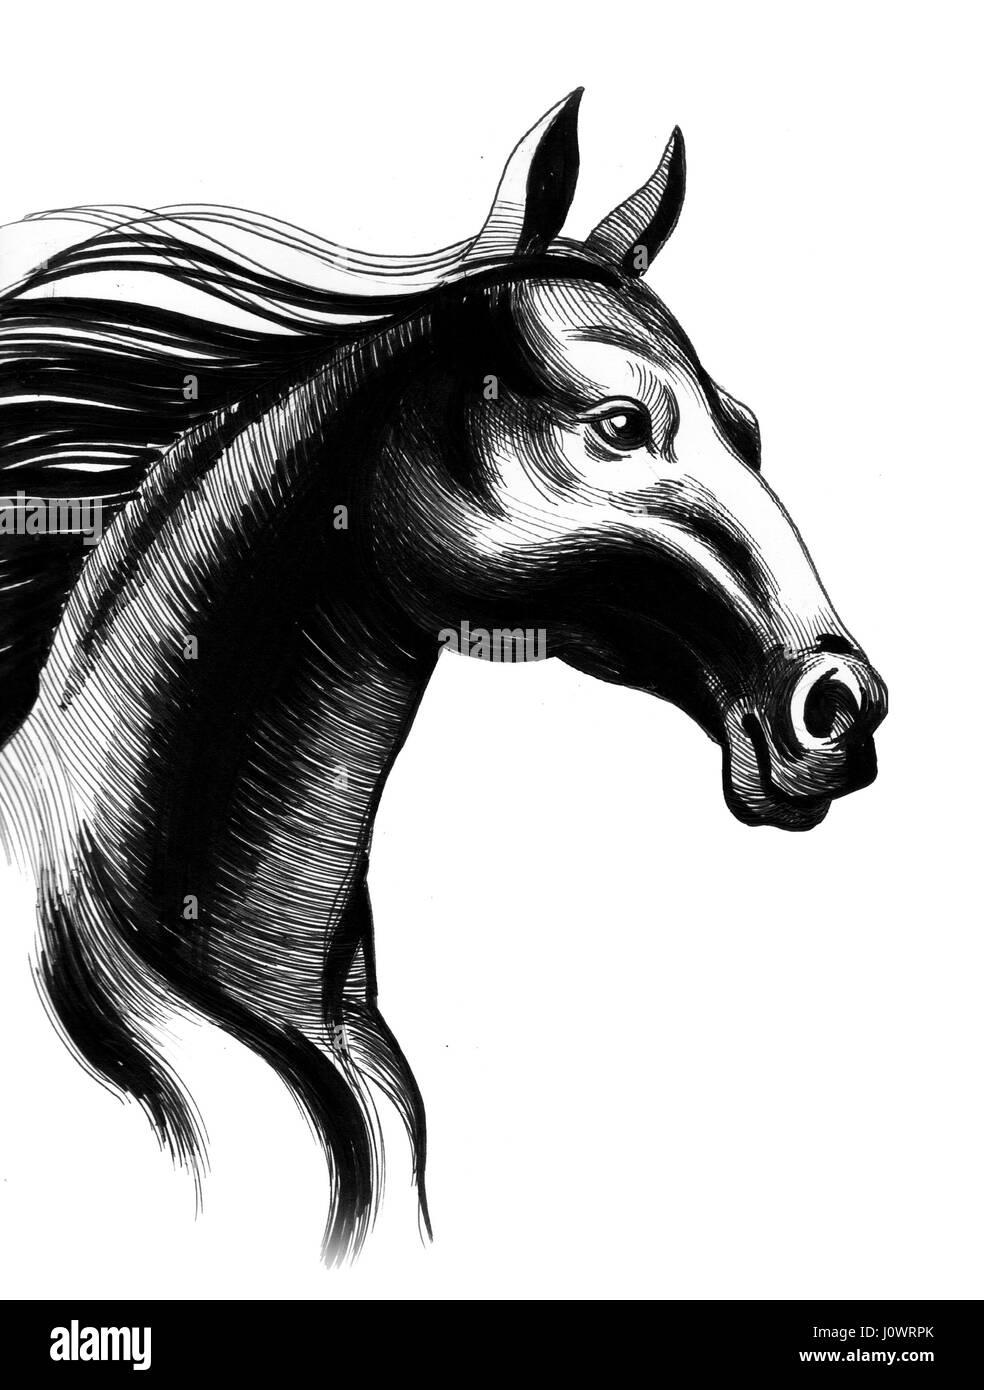 Black Horse Sketch Stock Photo Alamy